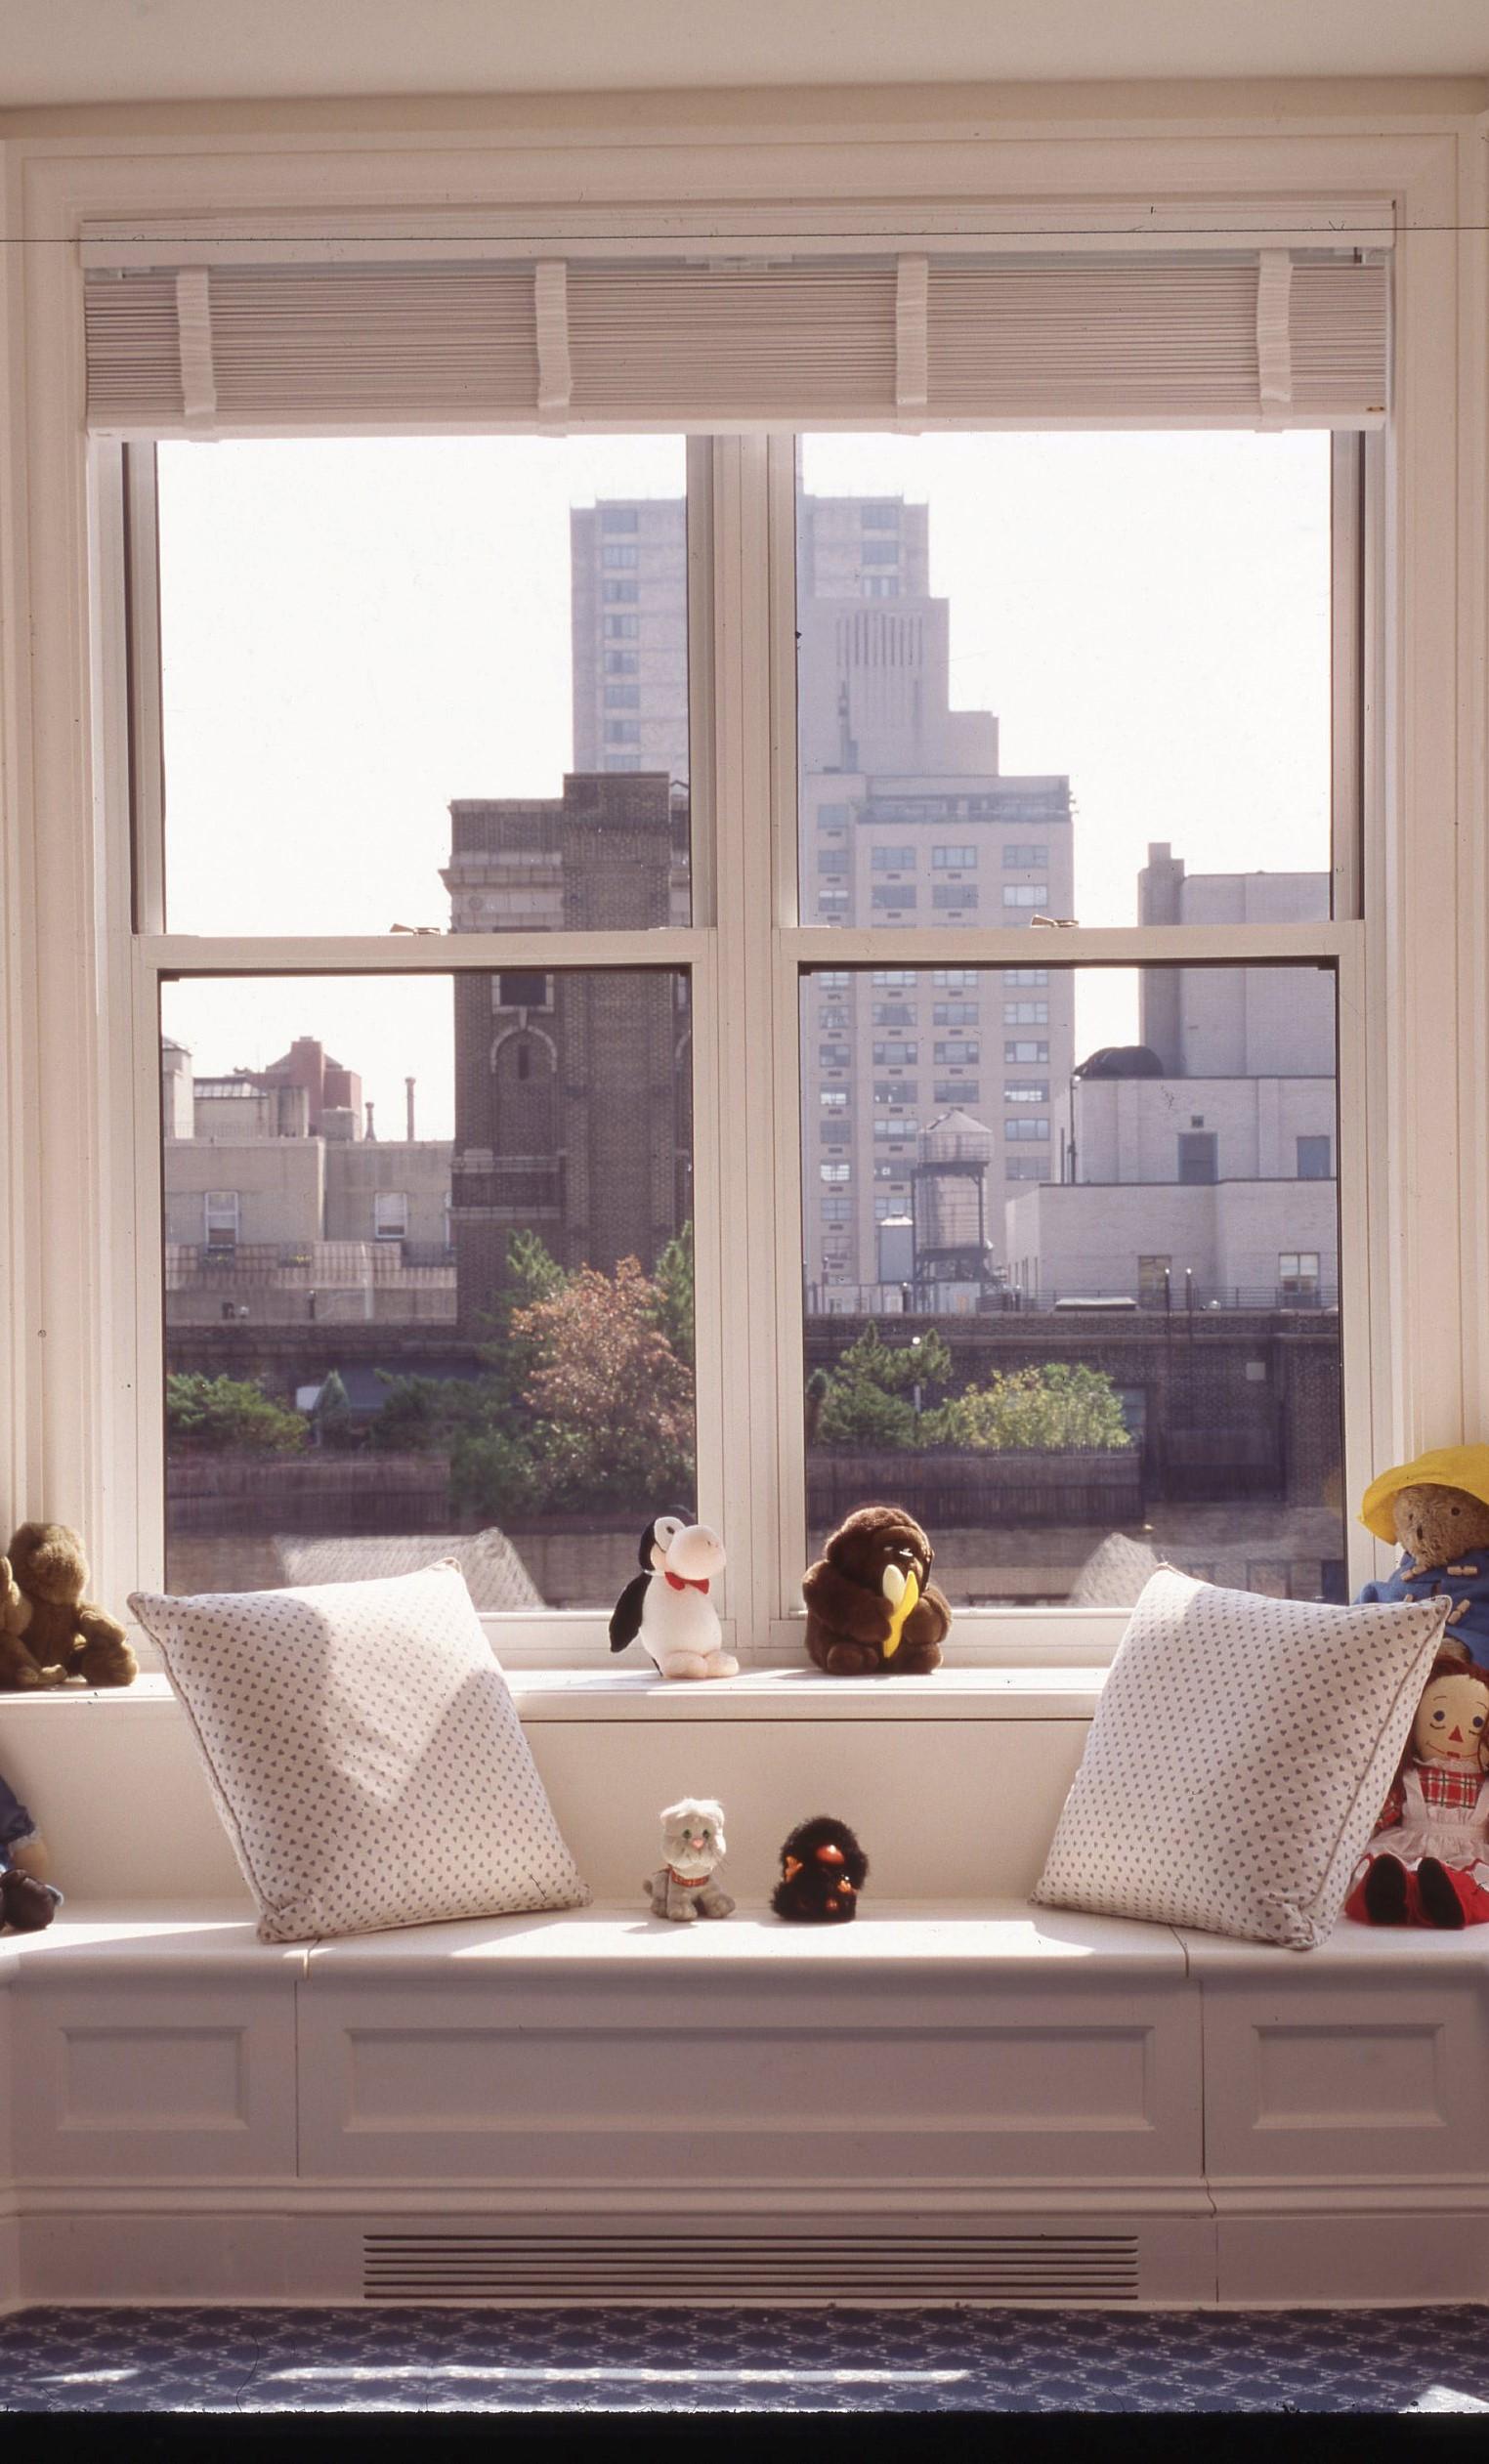 NYC DH window hi-res - Rev. 1.jpg